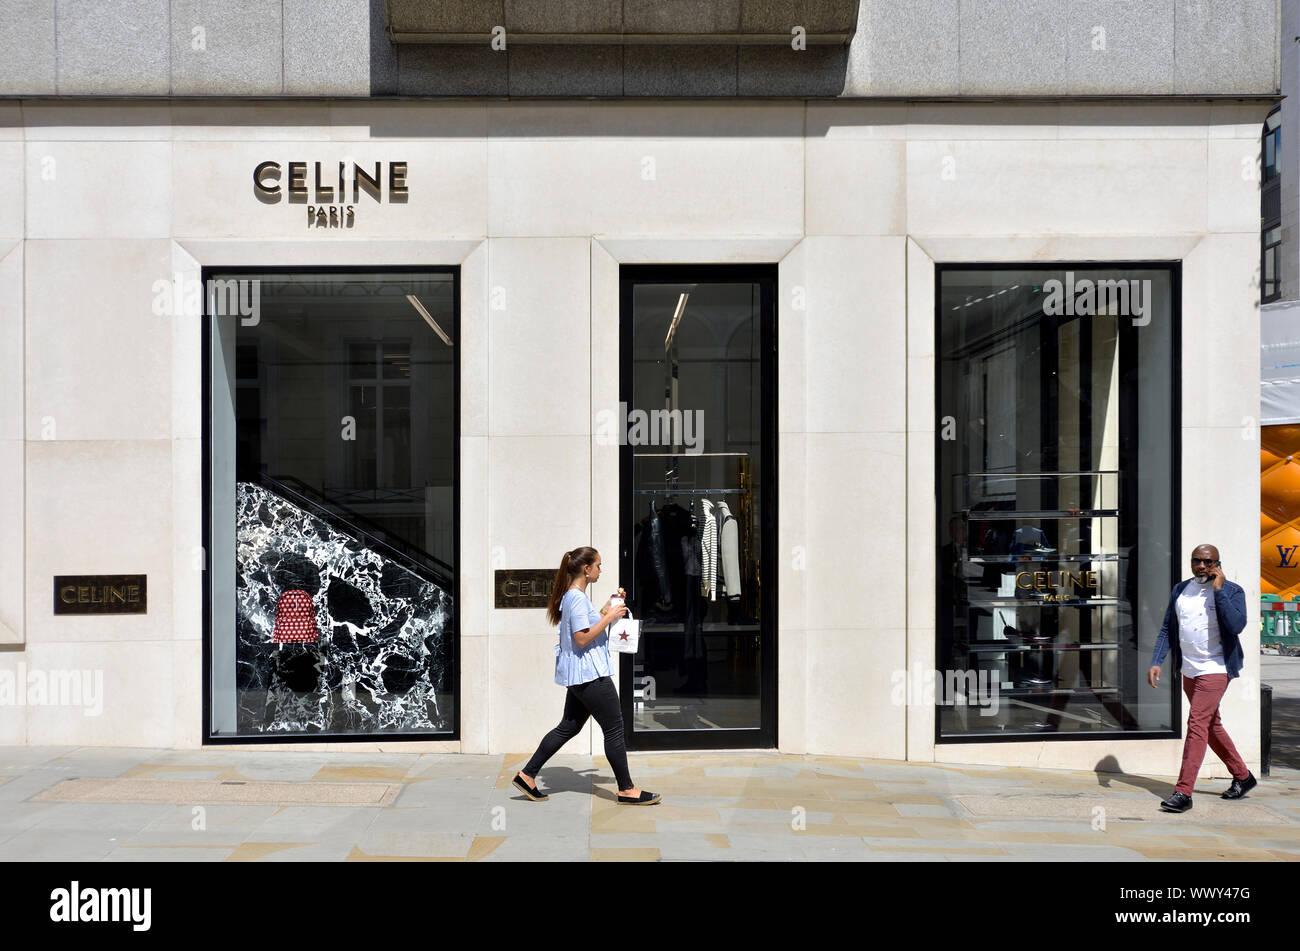 New Bond Street Stock Photos & New Bond Street Stock Images - Alamy